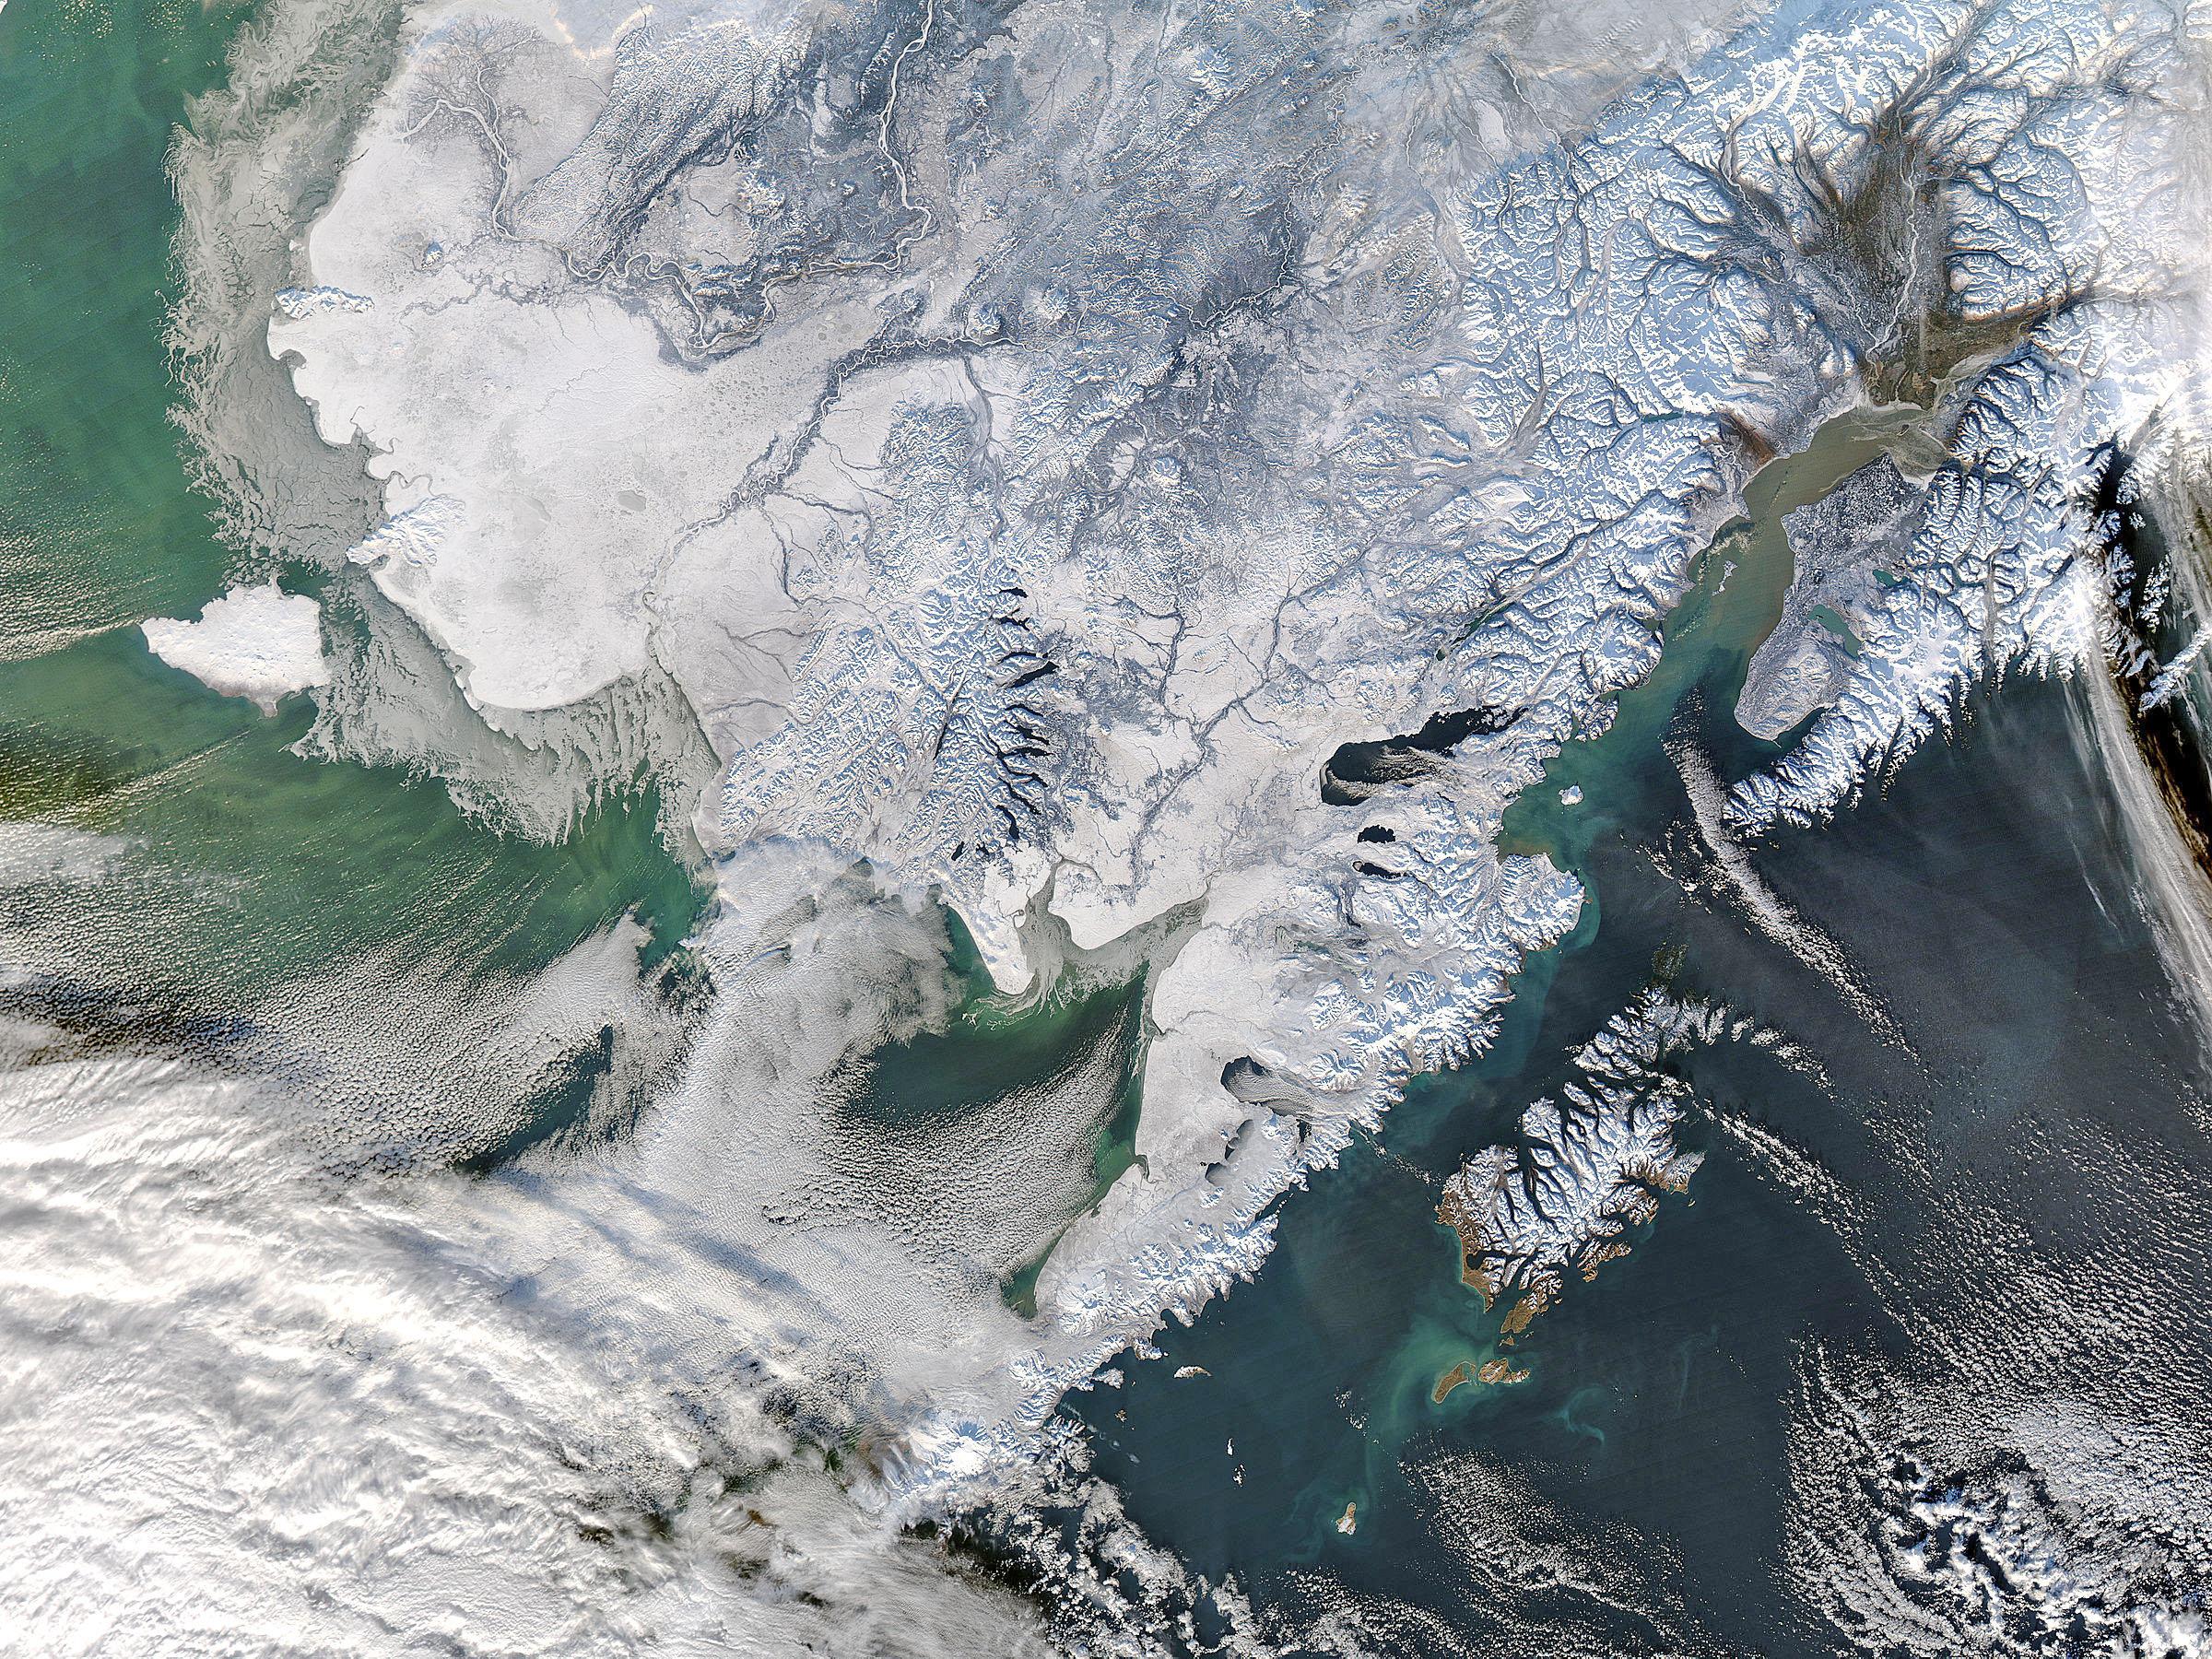 Southwestern Alaska